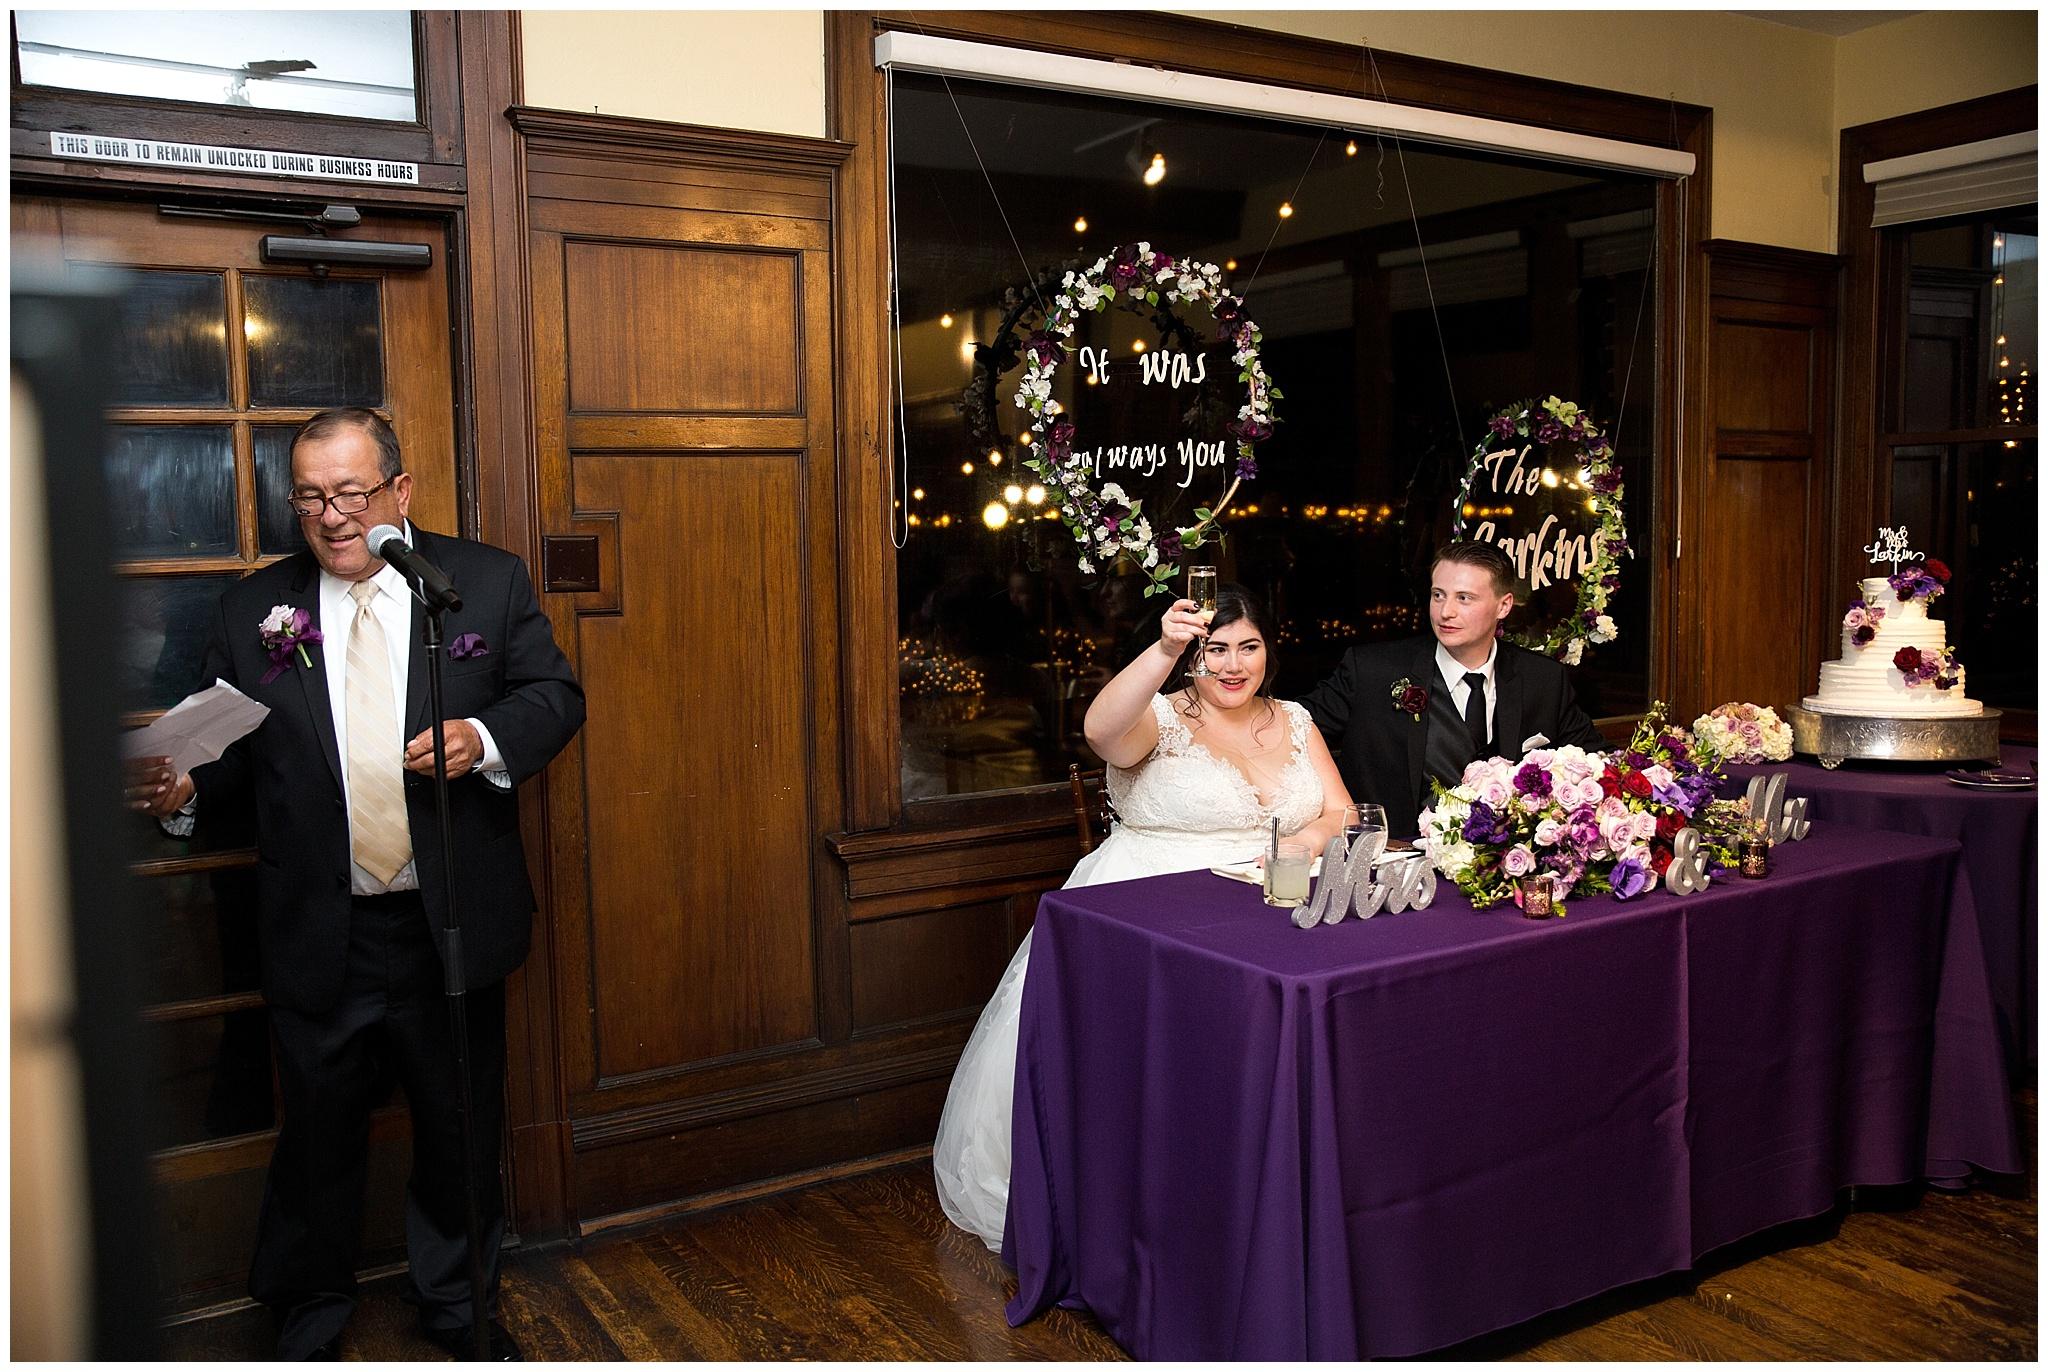 Carol_and_Grant_Wedding_3-3-18-8681.jpg